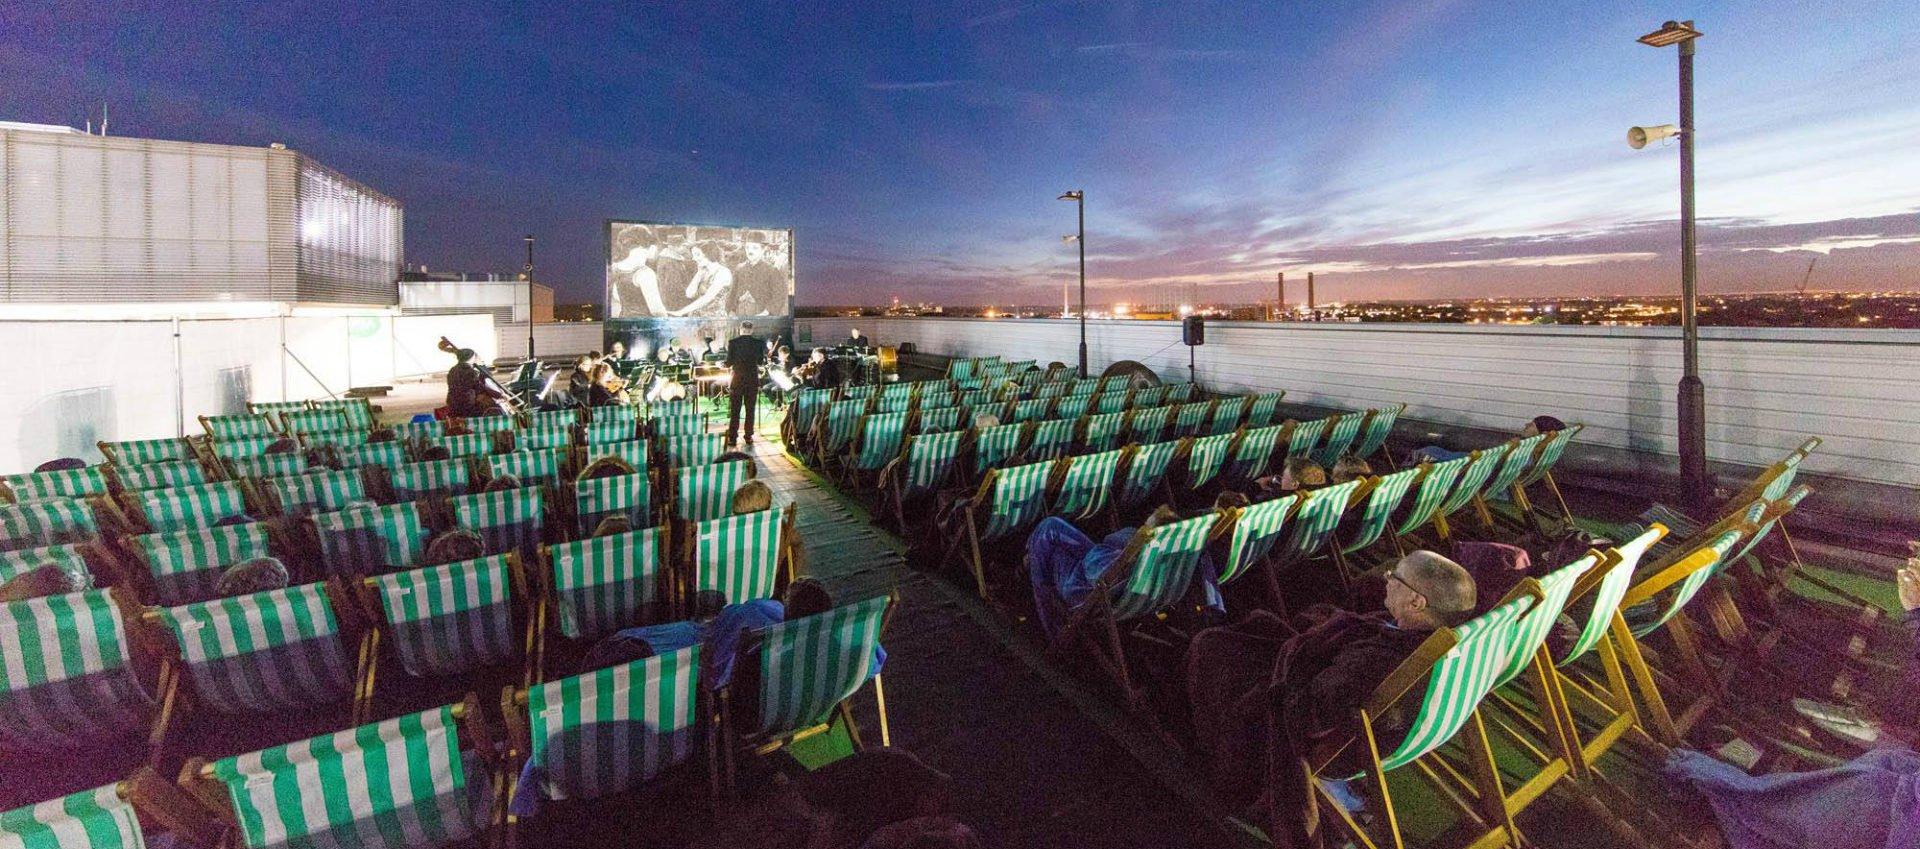 Popup Cinemas London 2017